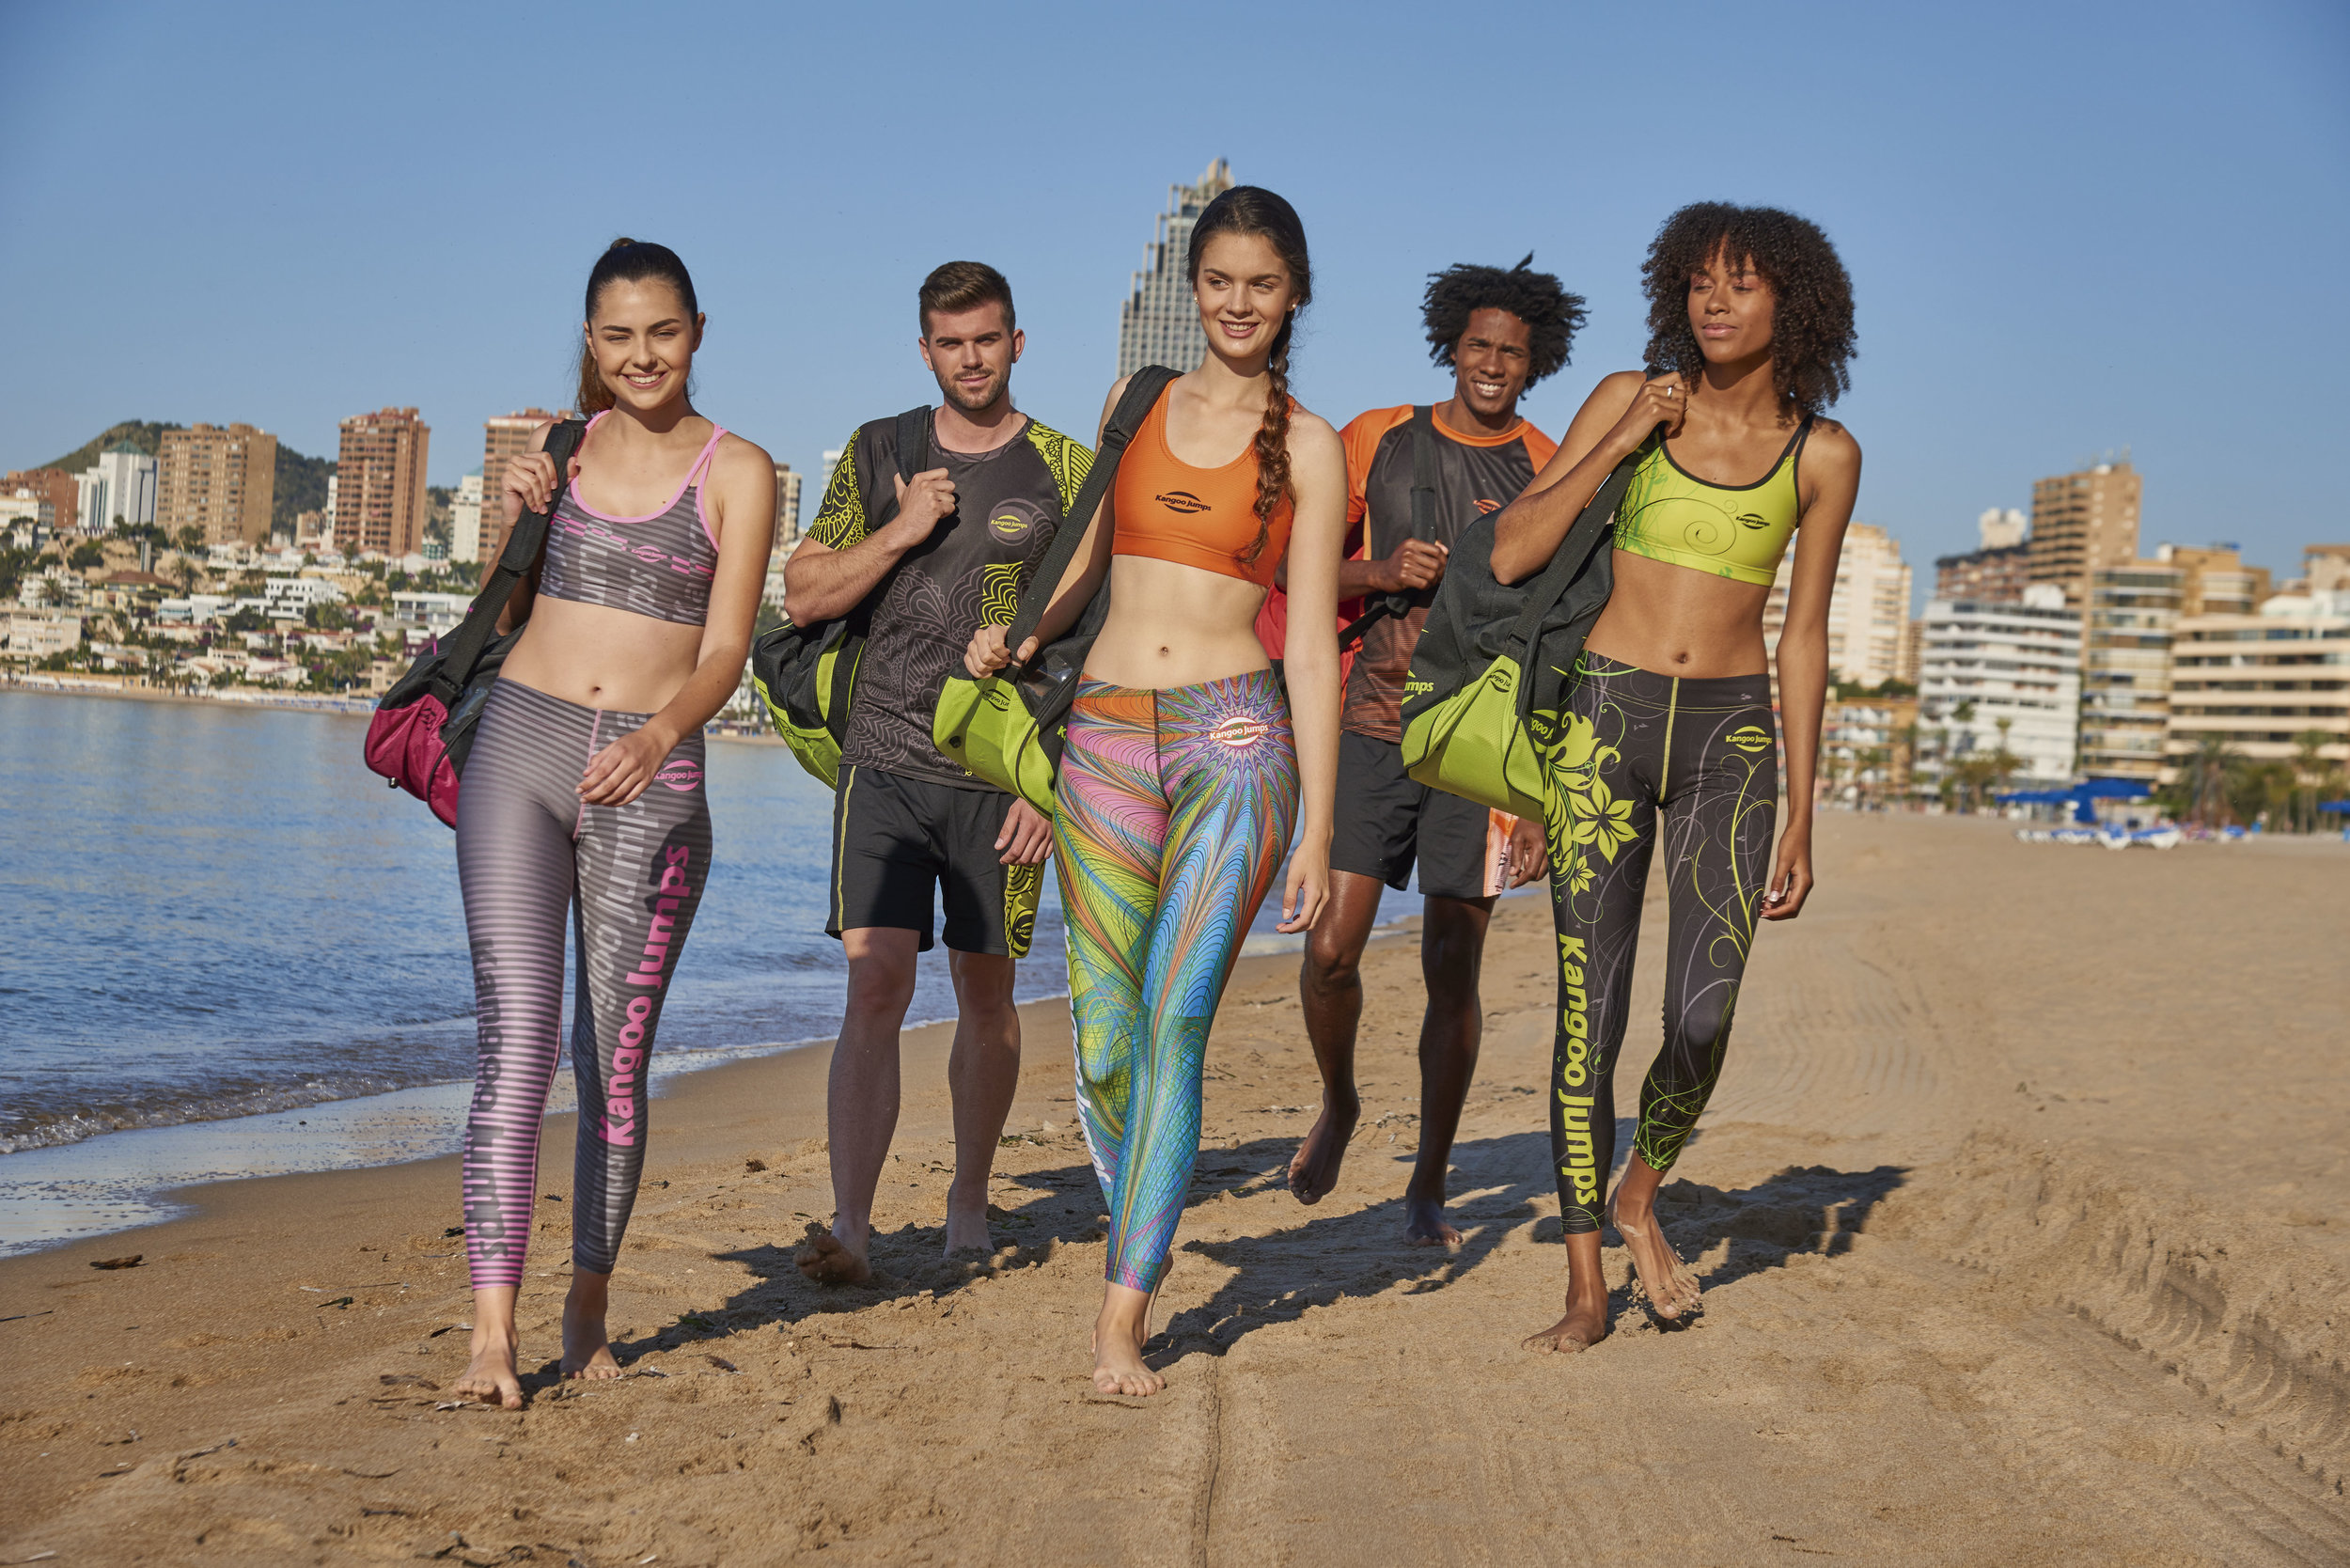 5 Front on Beach W Legging & Shorts.jpg